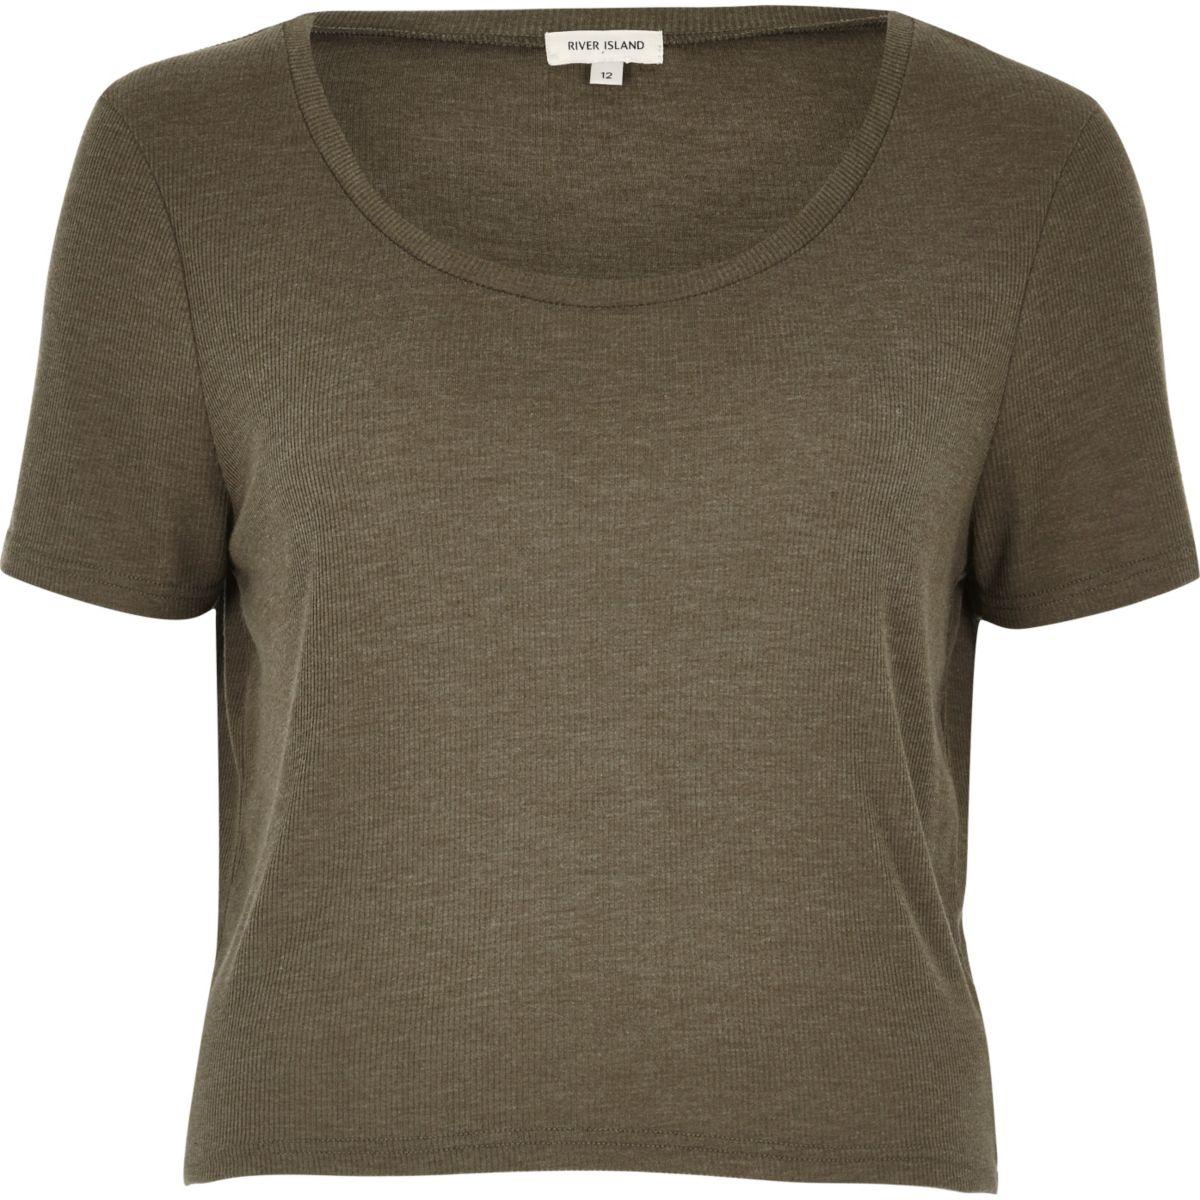 Khaki relaxed scoop neck T-shirt